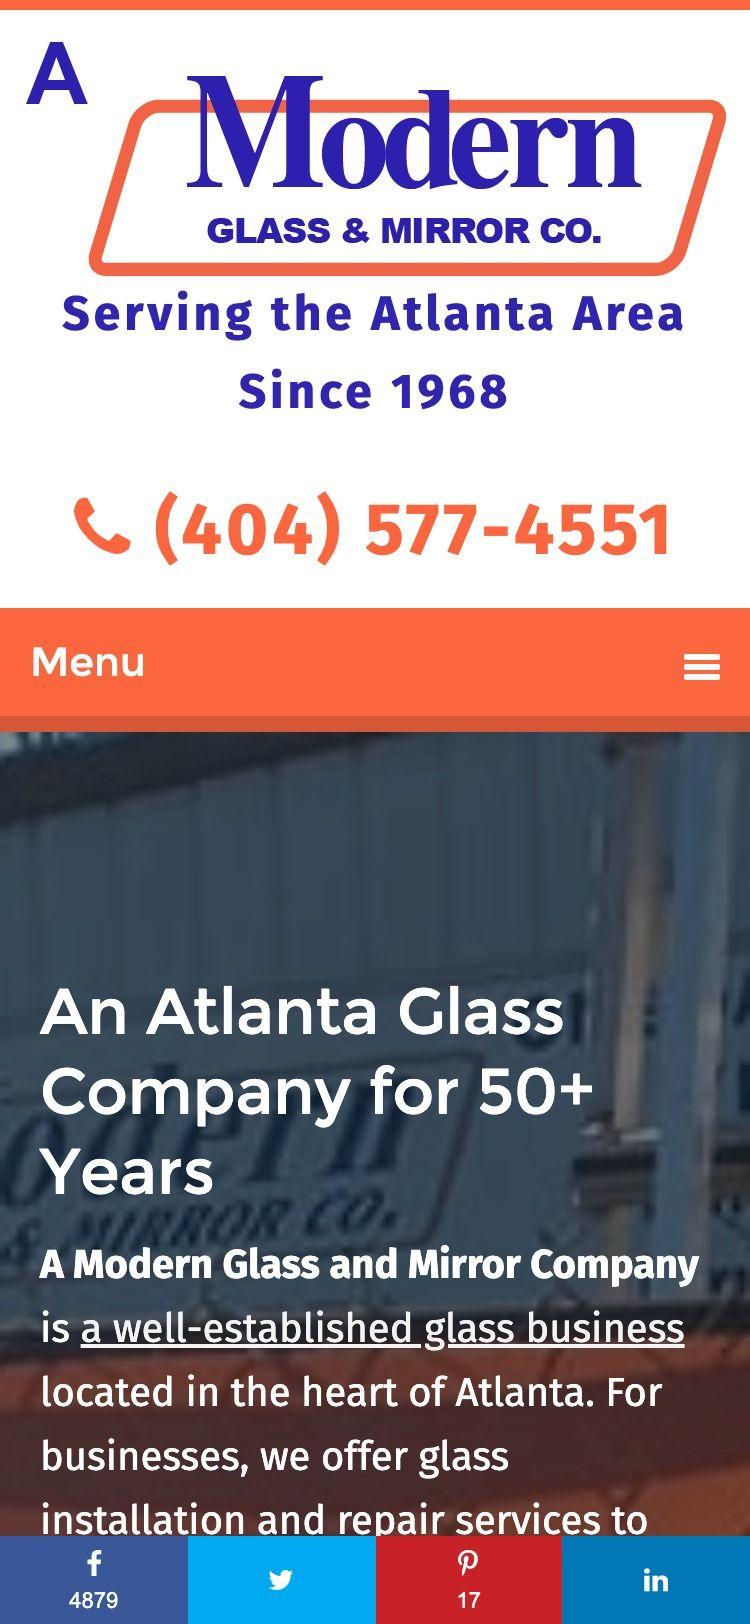 A Modern Glass (Atlanta, GA) Mobile Phone Web Design